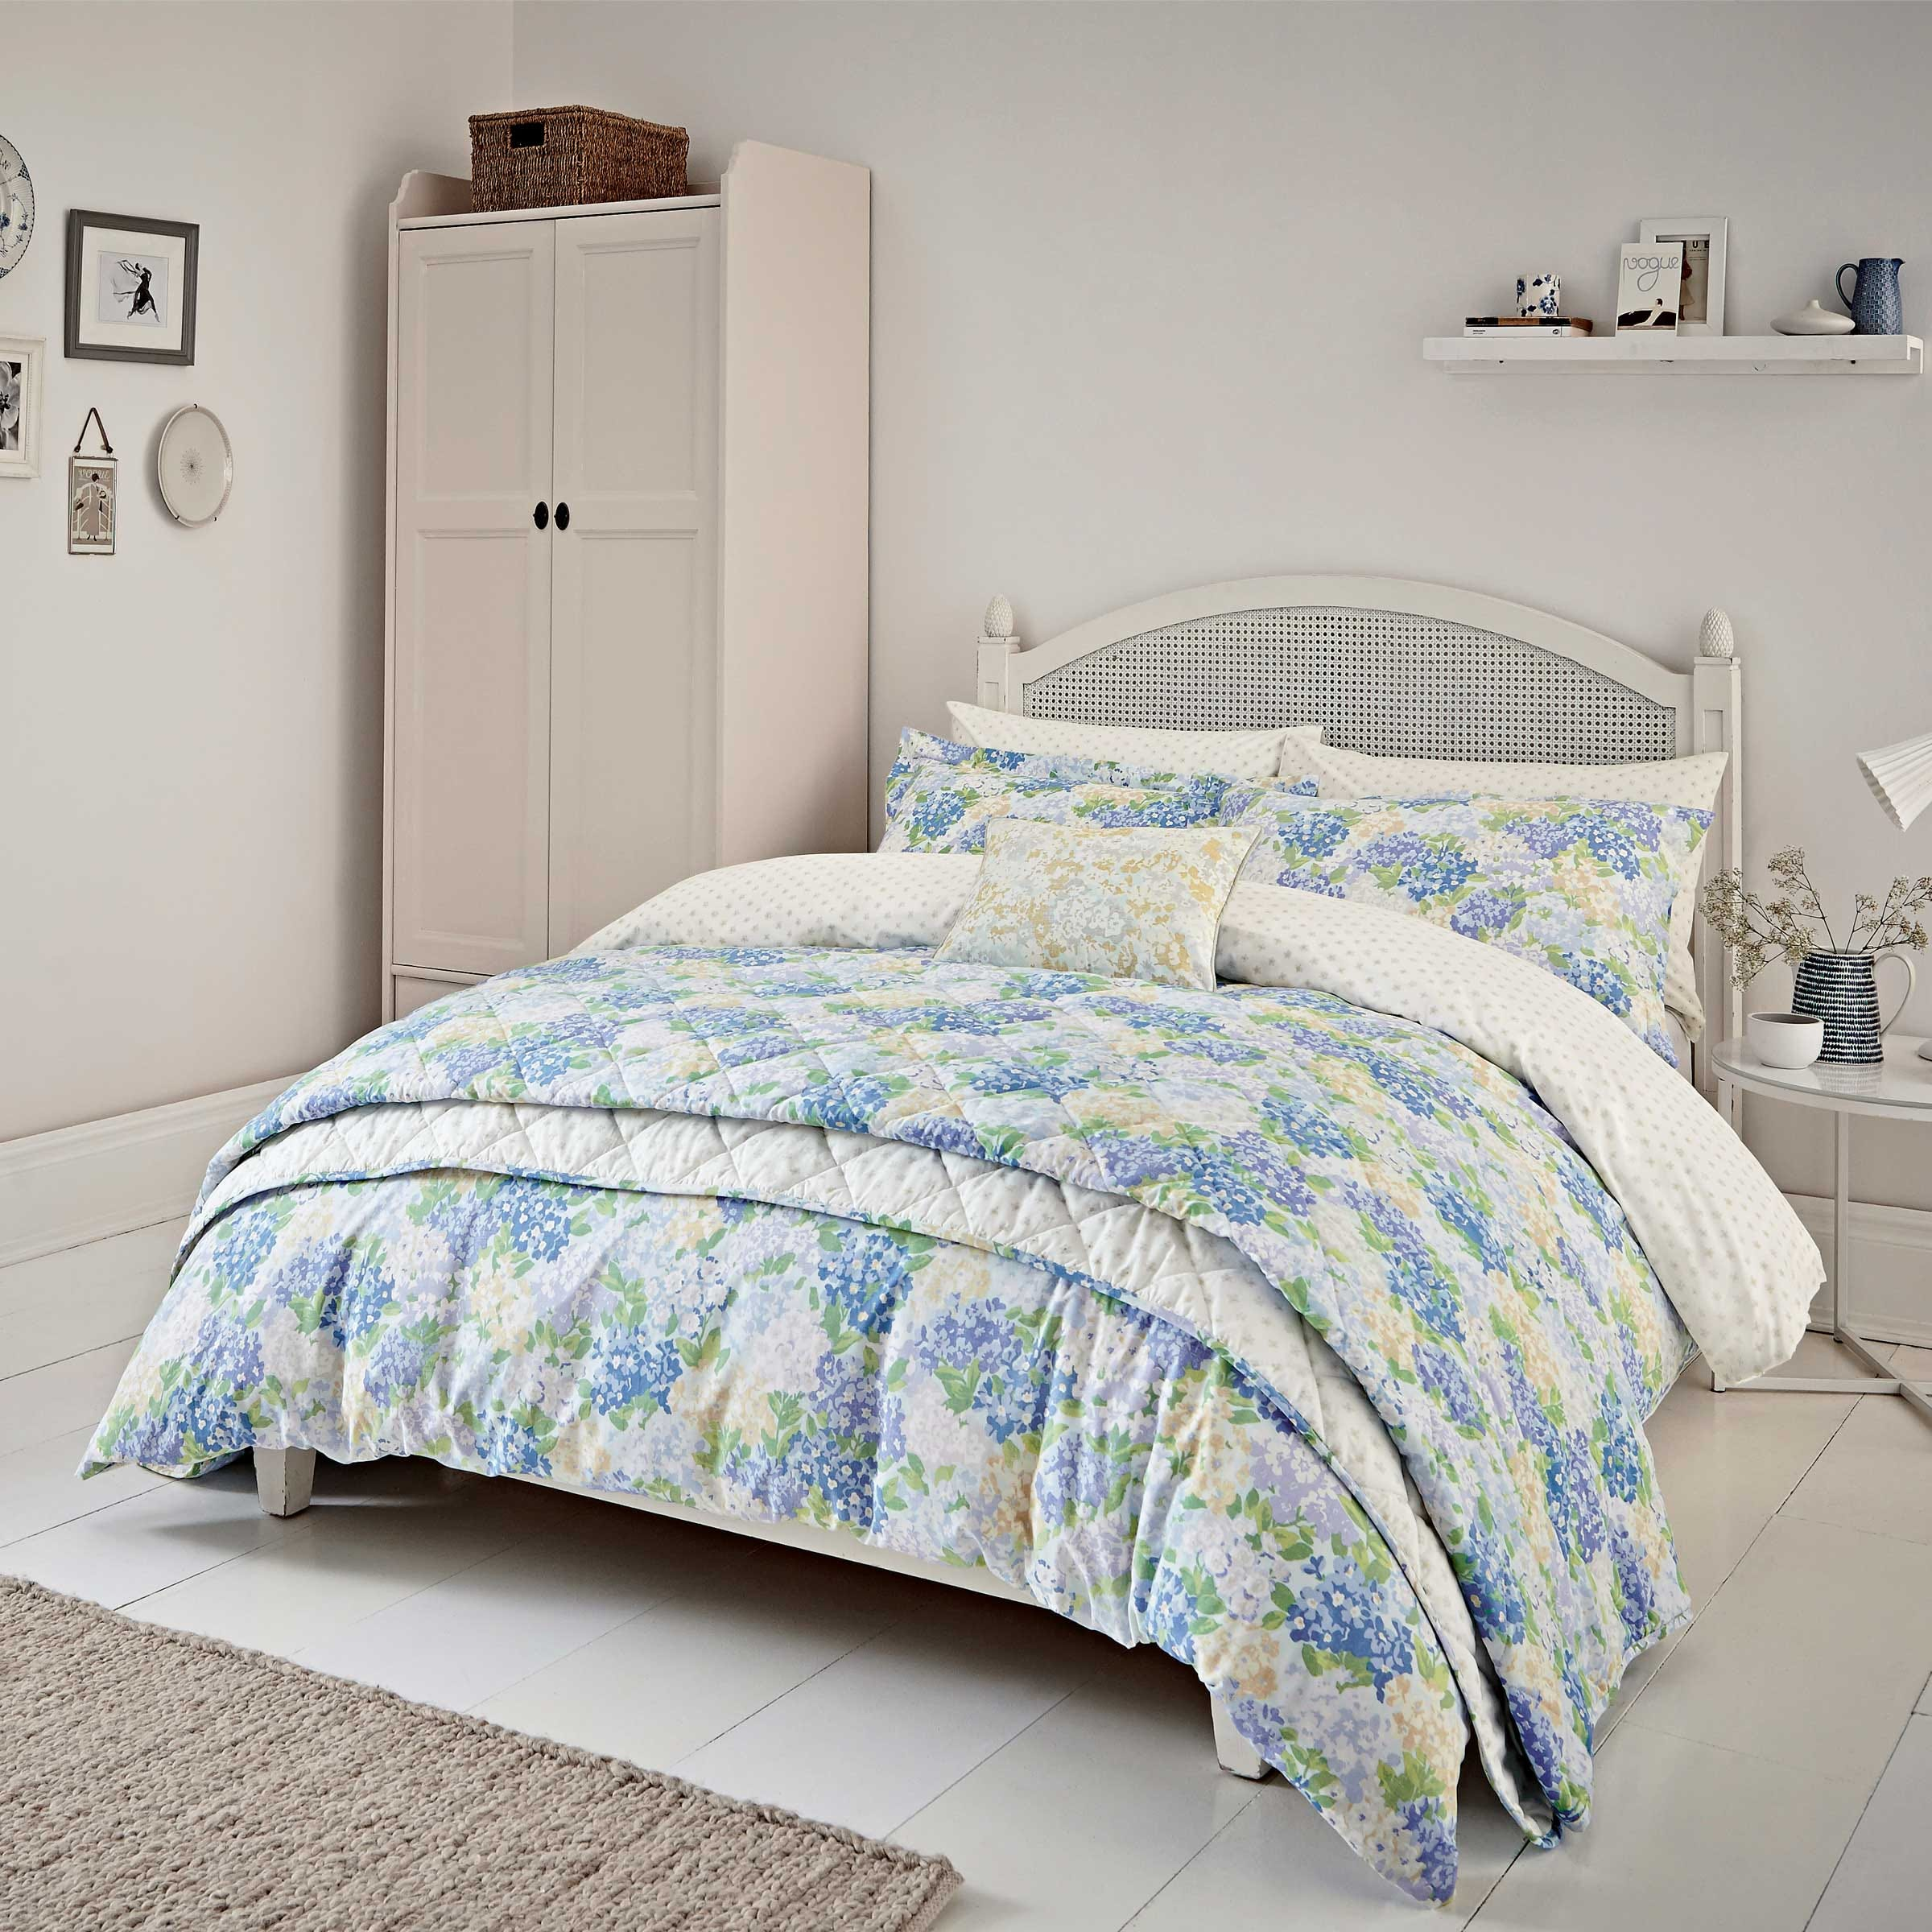 Sanderson Bedding Cottage Garden Kingsize Duvet Cover Set Blue